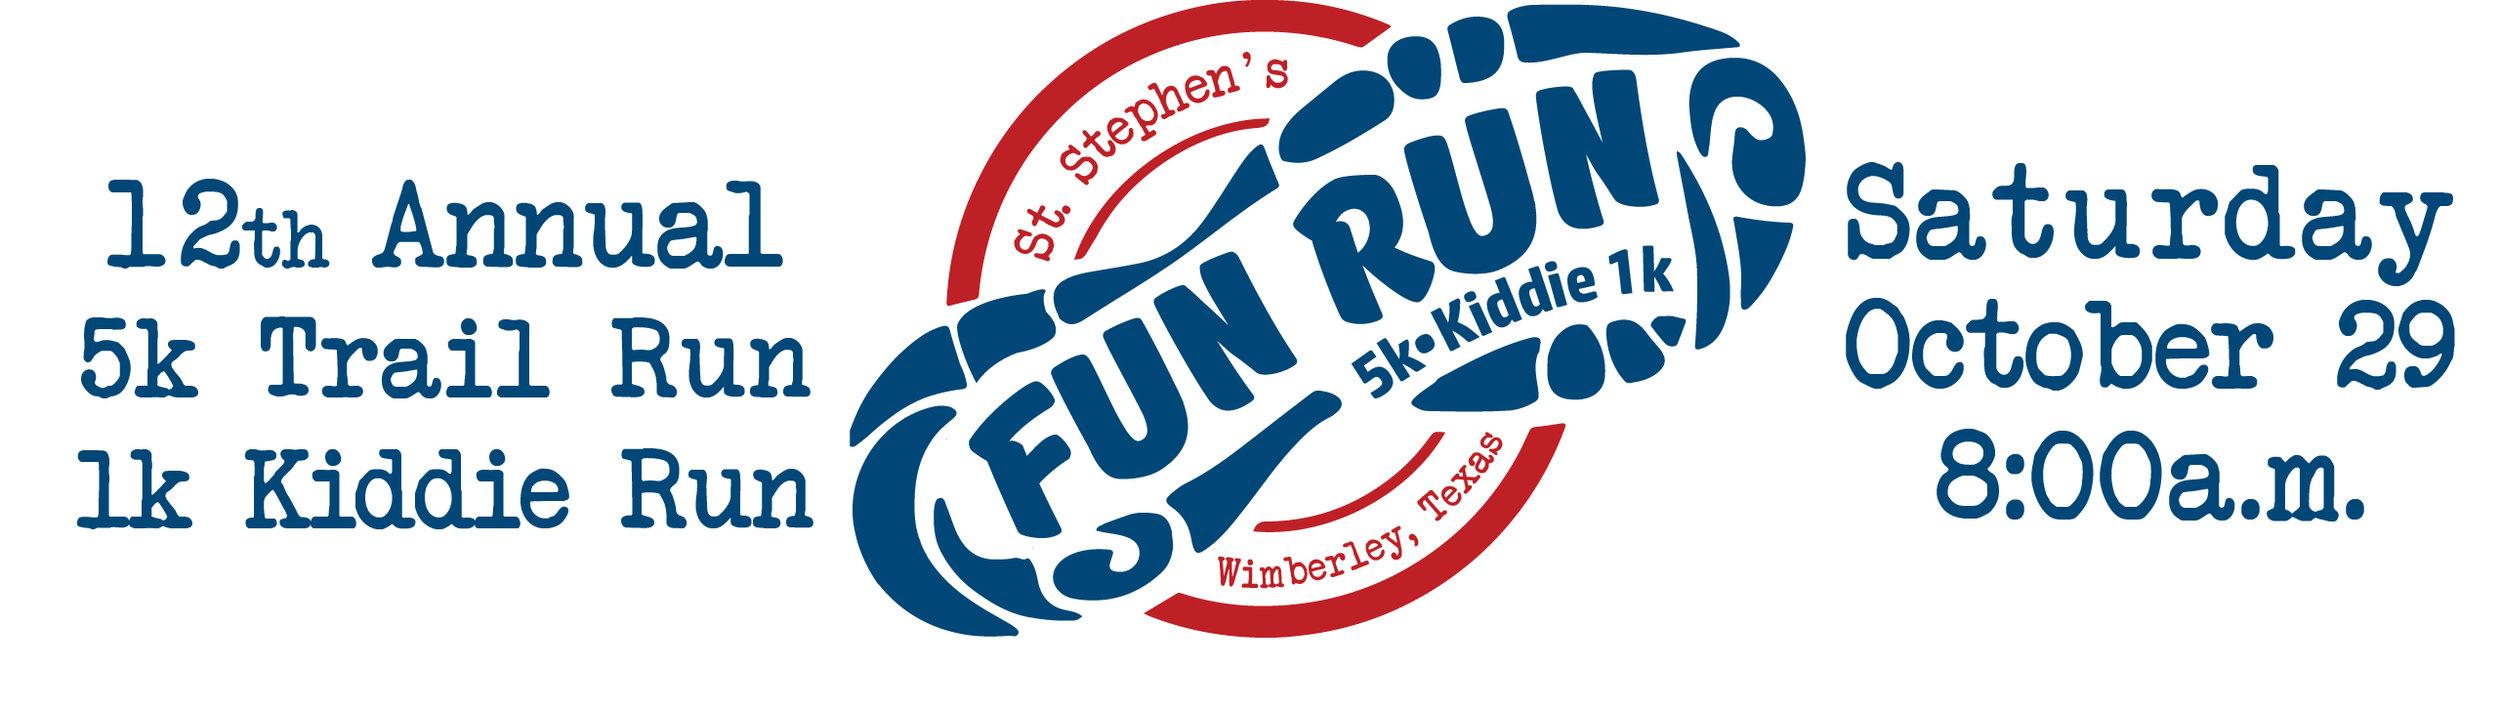 race logo 2016 - header.jpg